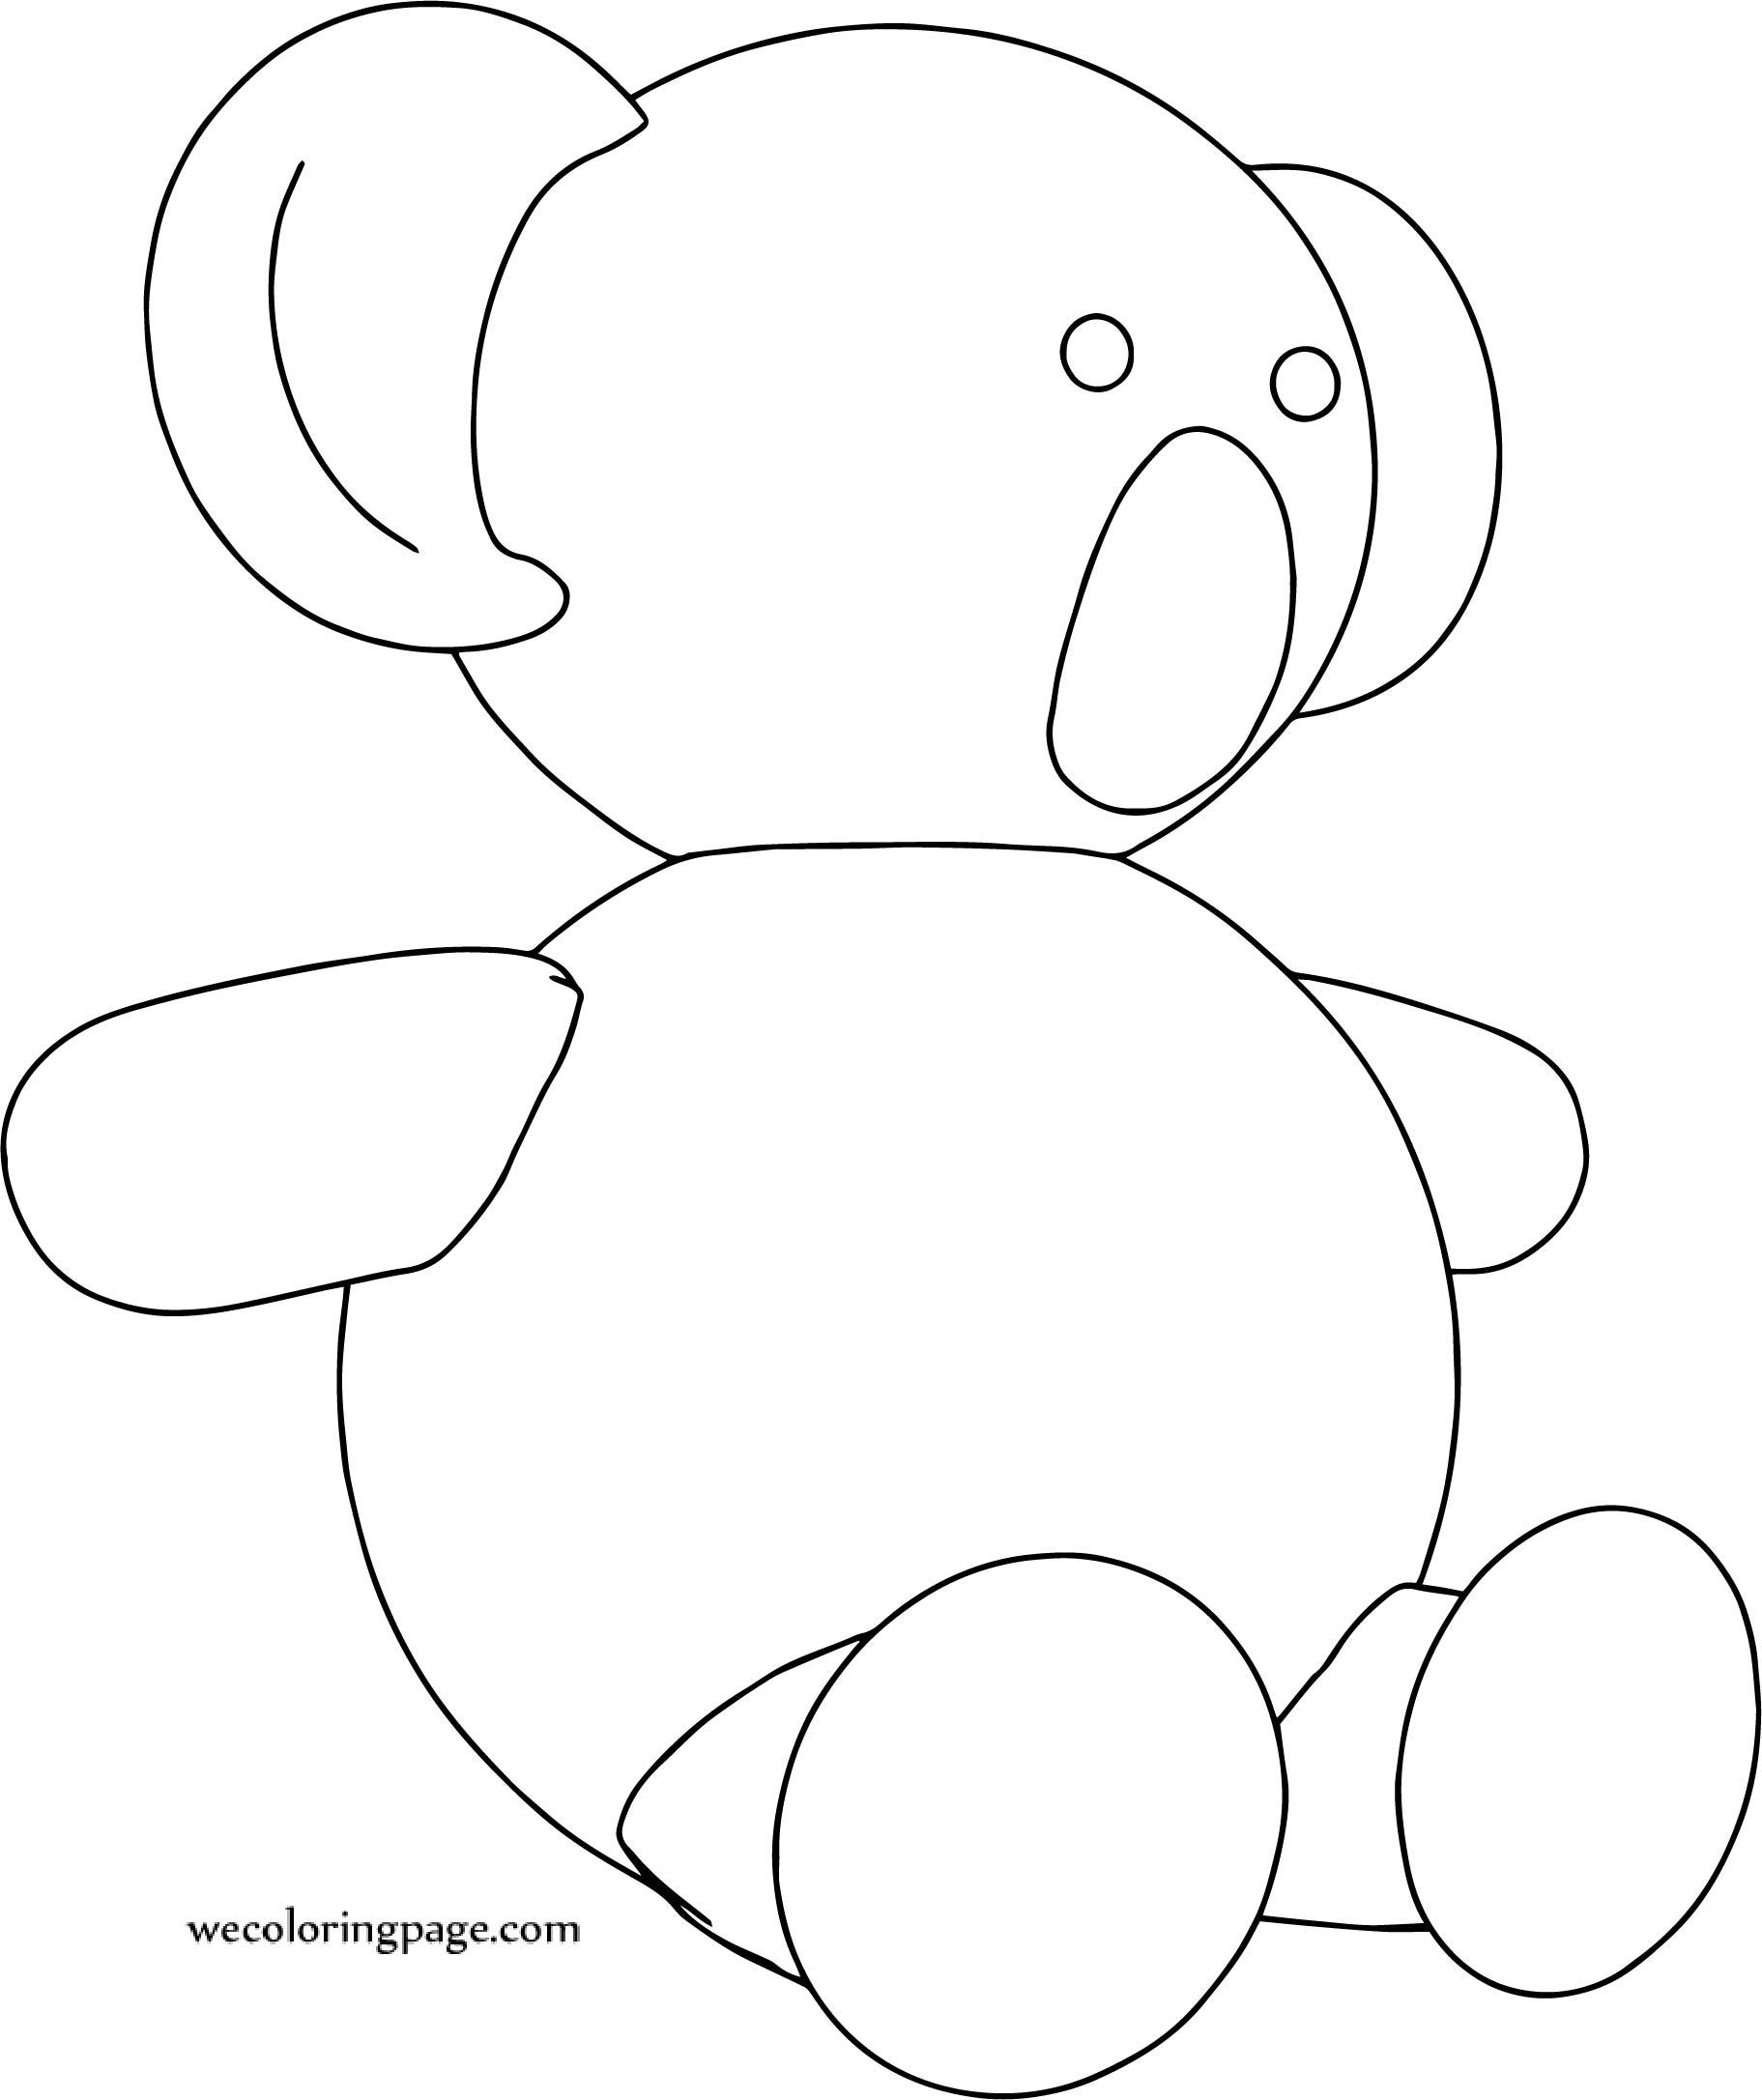 Koala Coloring Page Toy Sheets